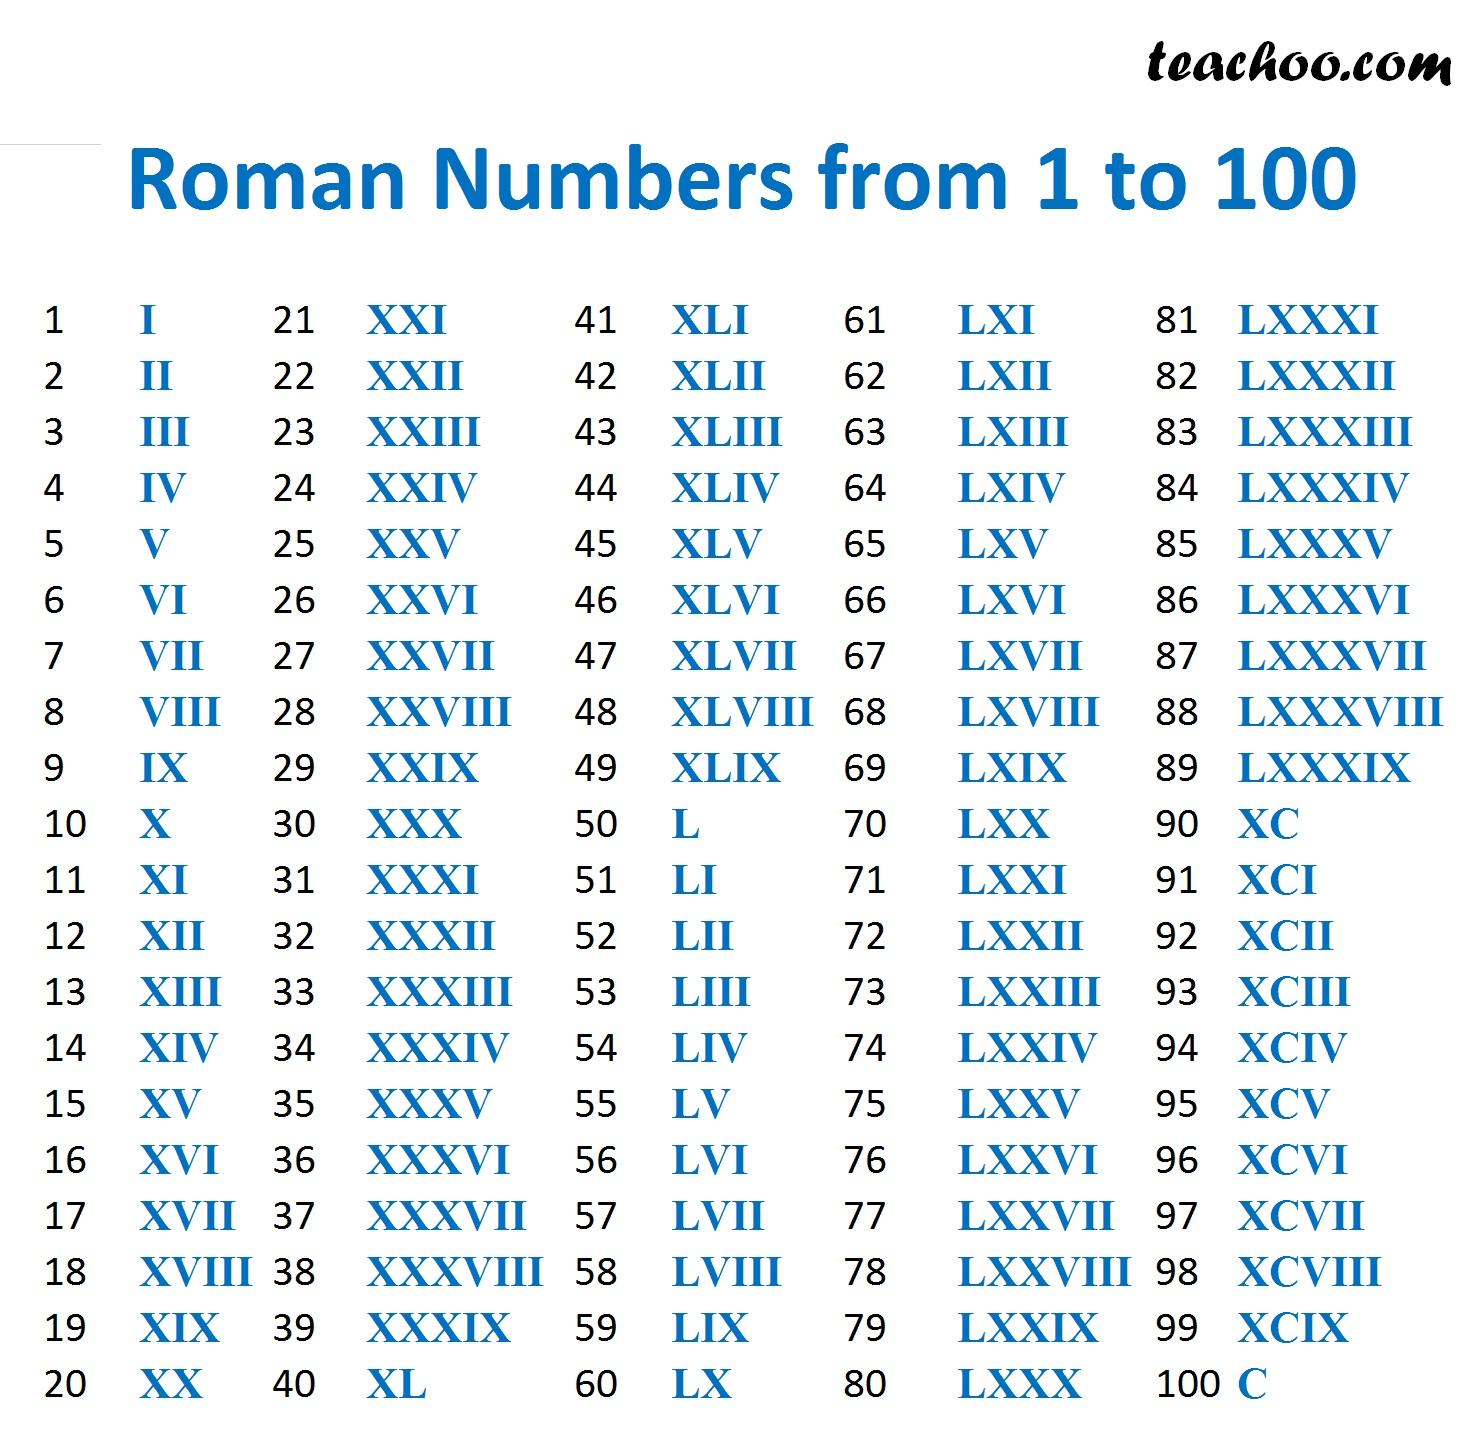 Roman Nunbers